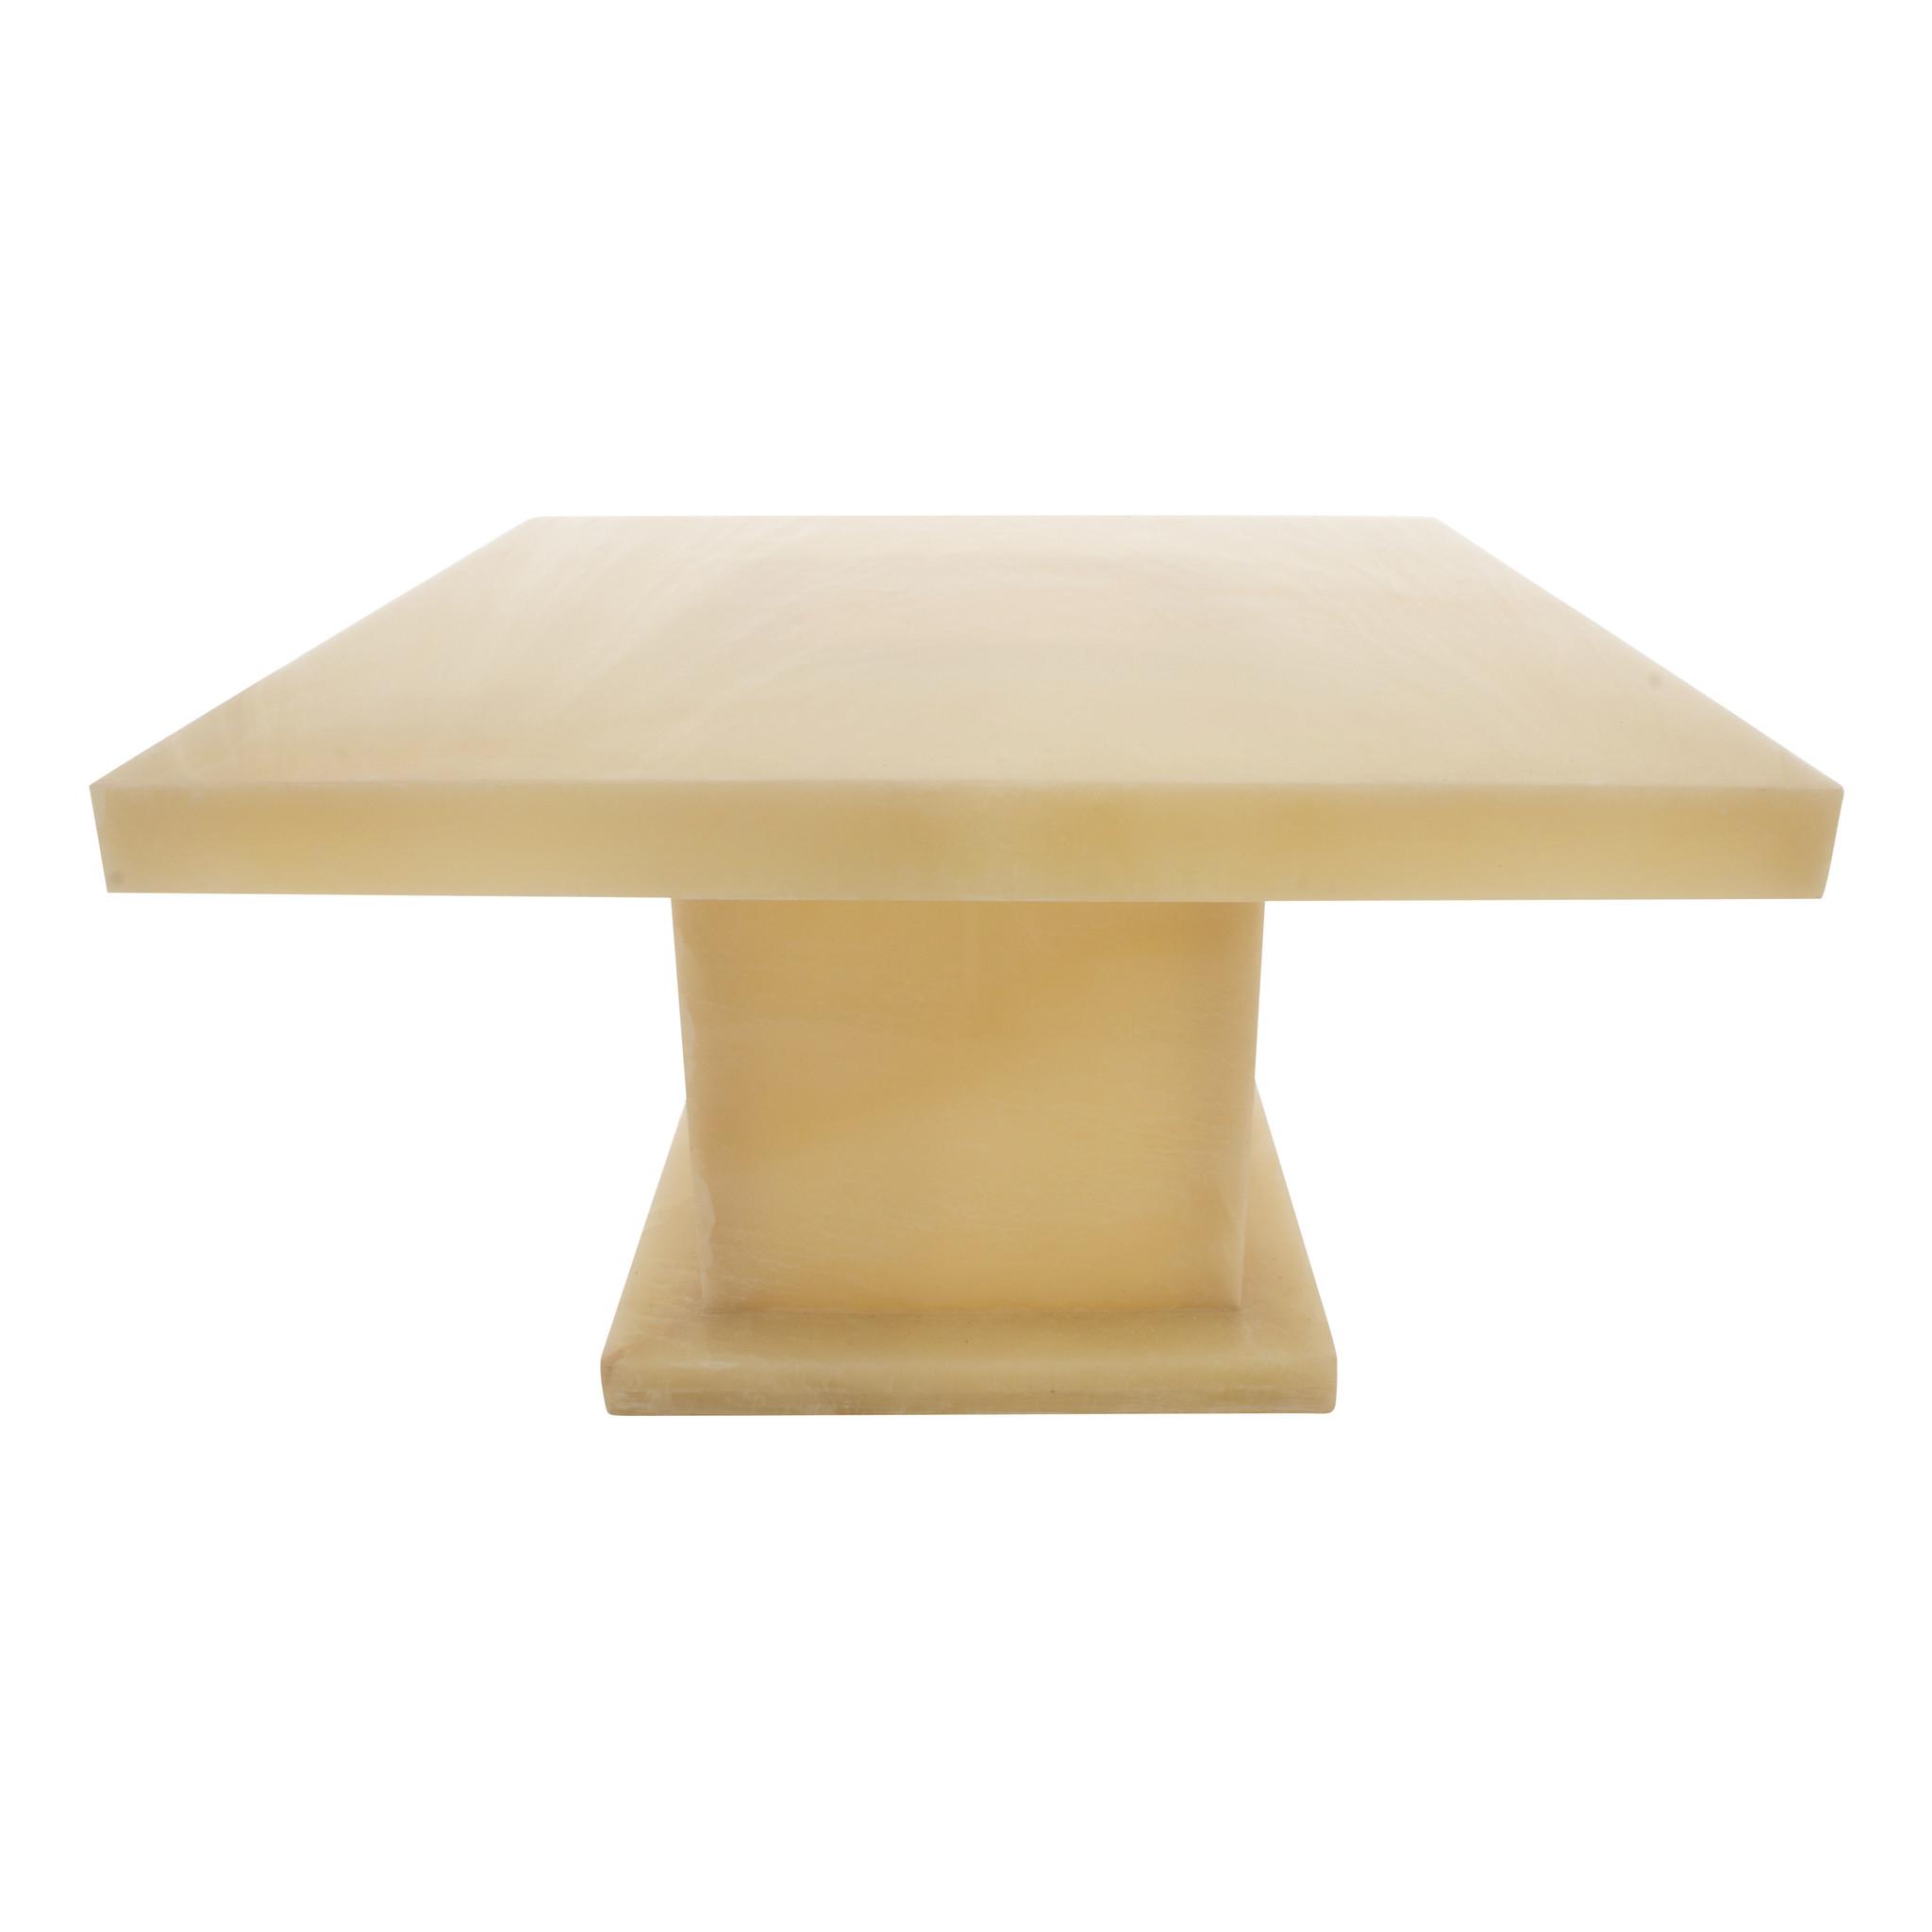 Indomarmer Onyx Coffee table Square 80x80x45 cm